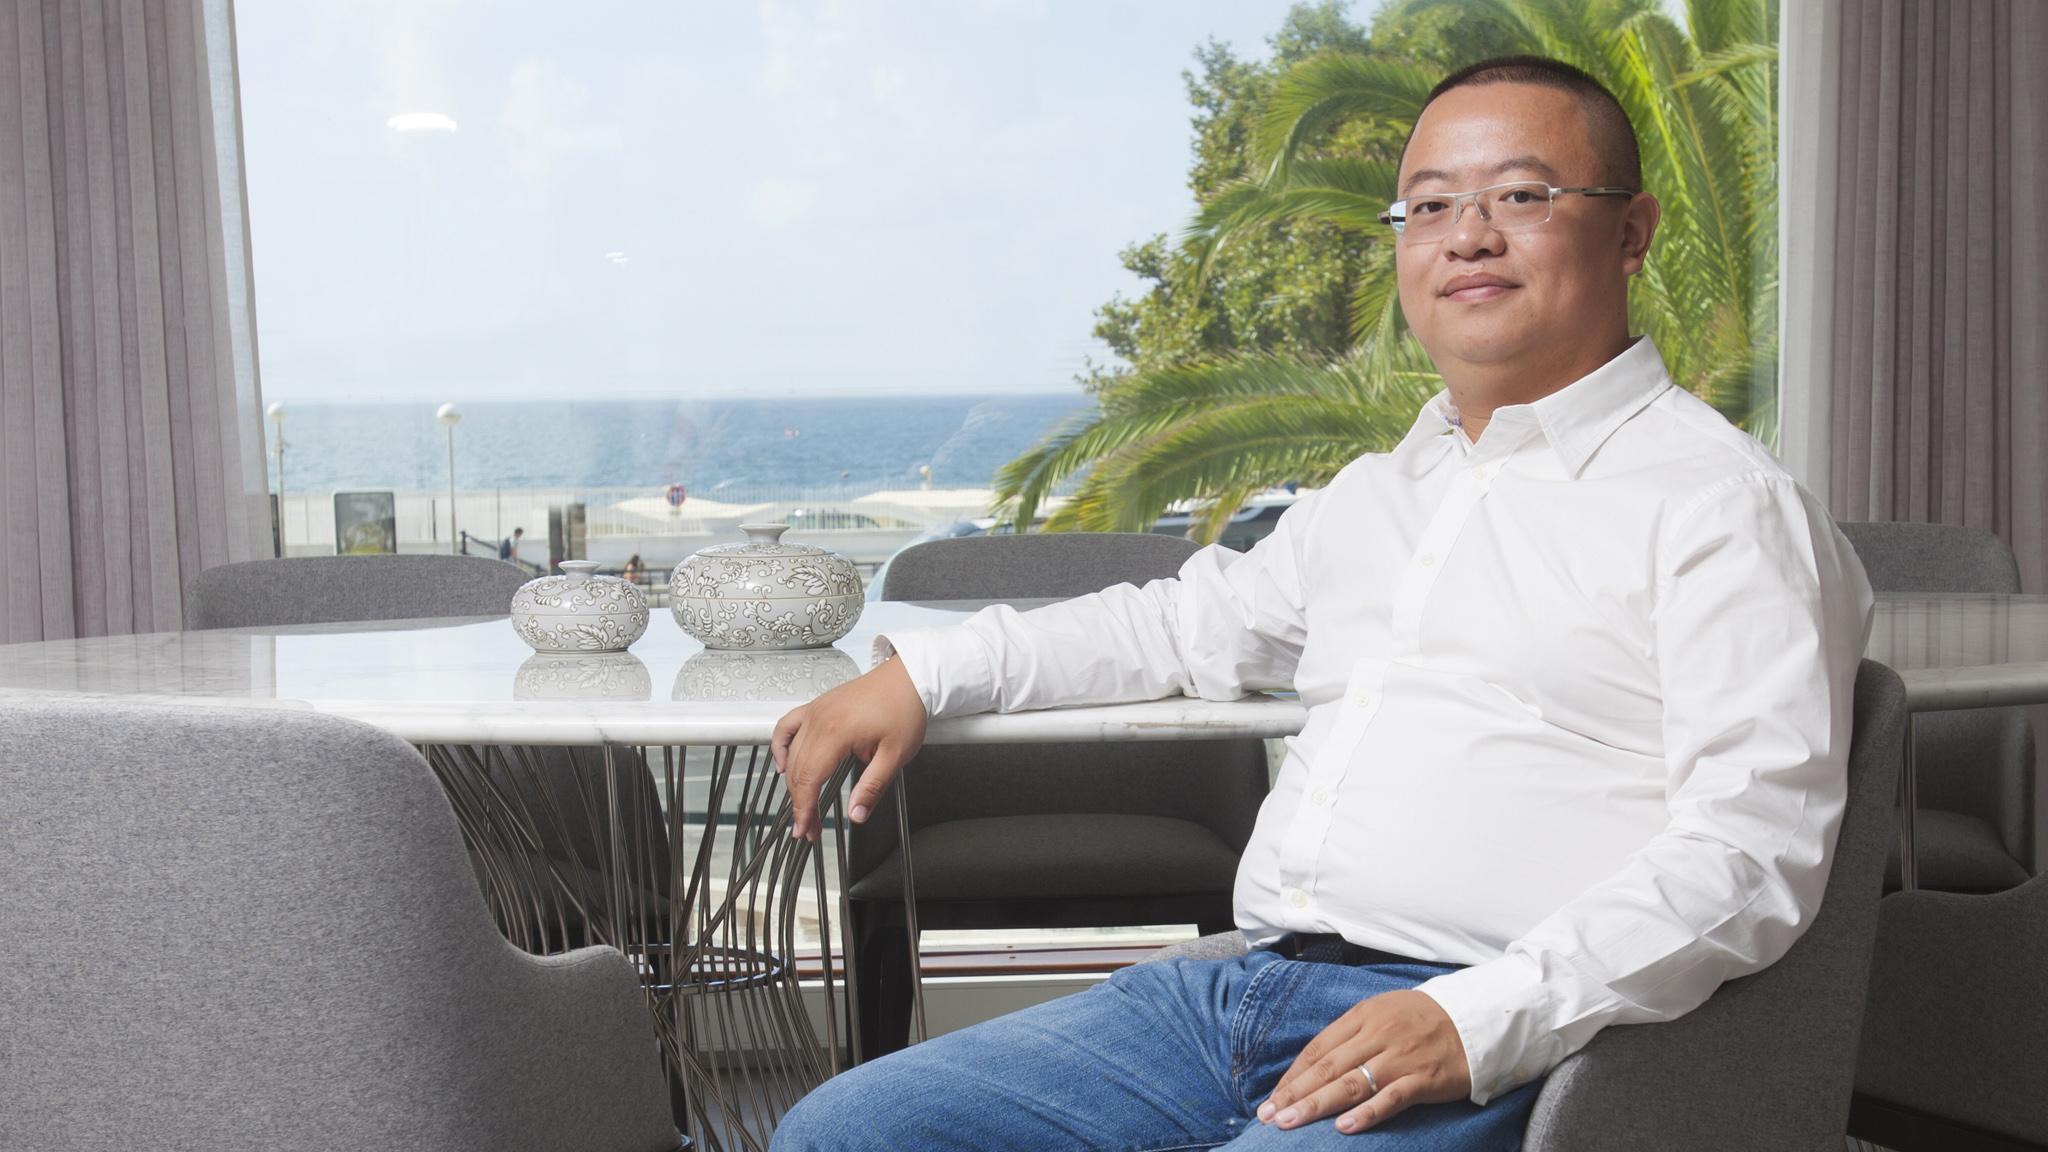 Sea, sun and easy visas lure China buyers